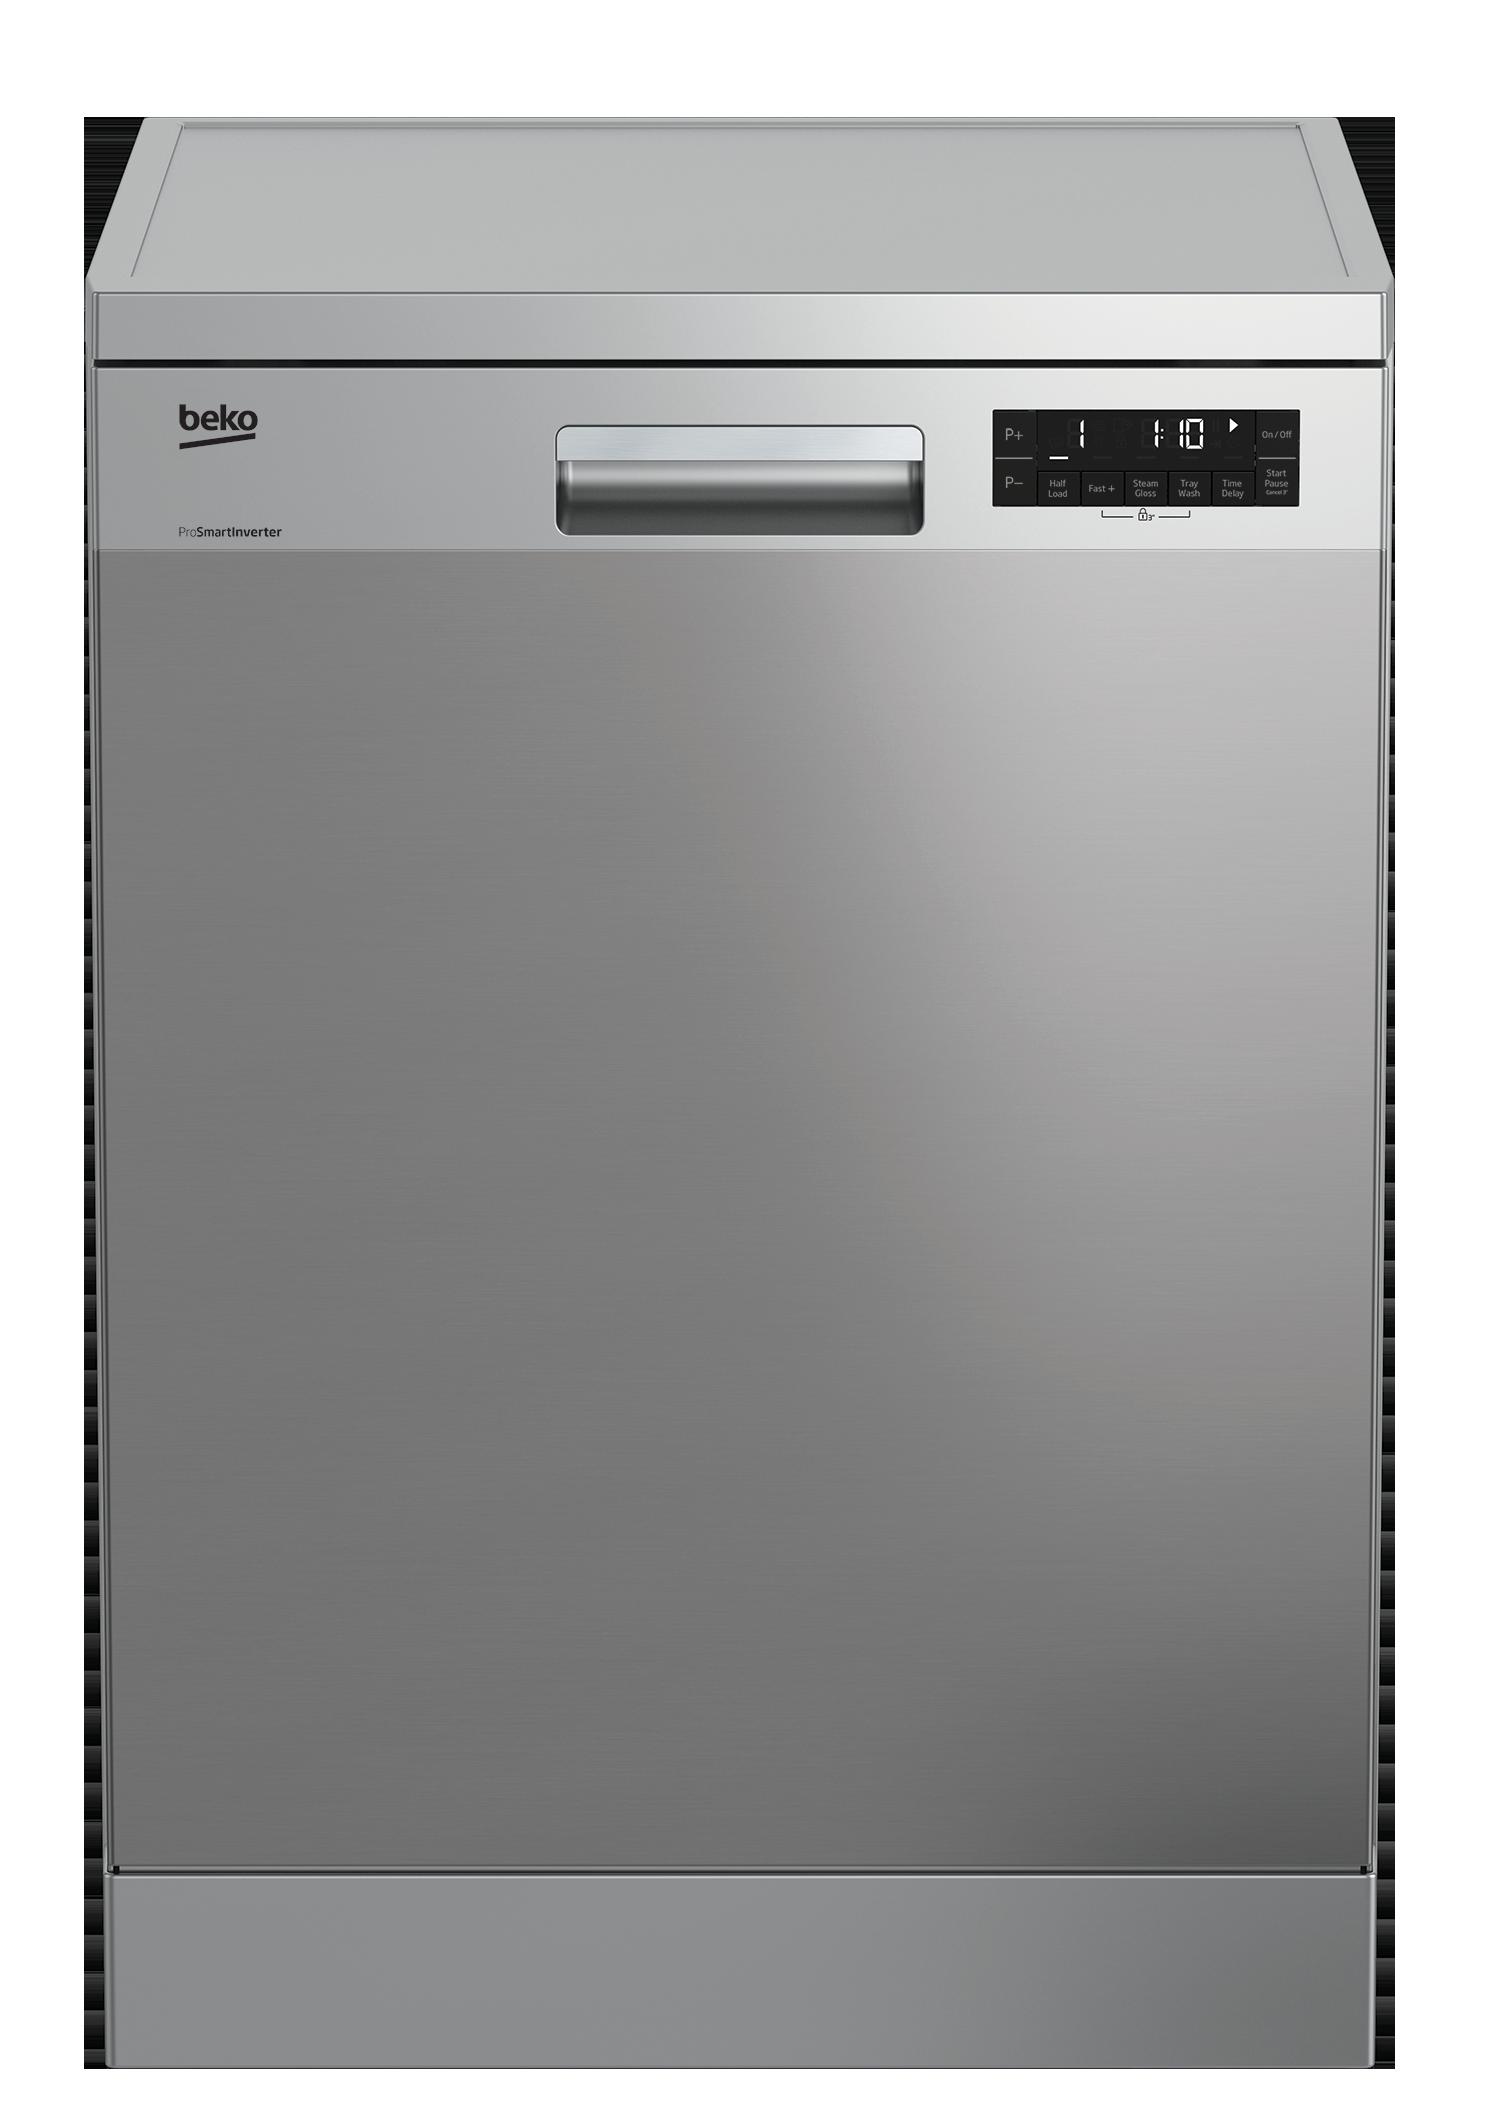 Freestanding Dishwasher 14 Place Settings Full Size Dfn28j21x Beko